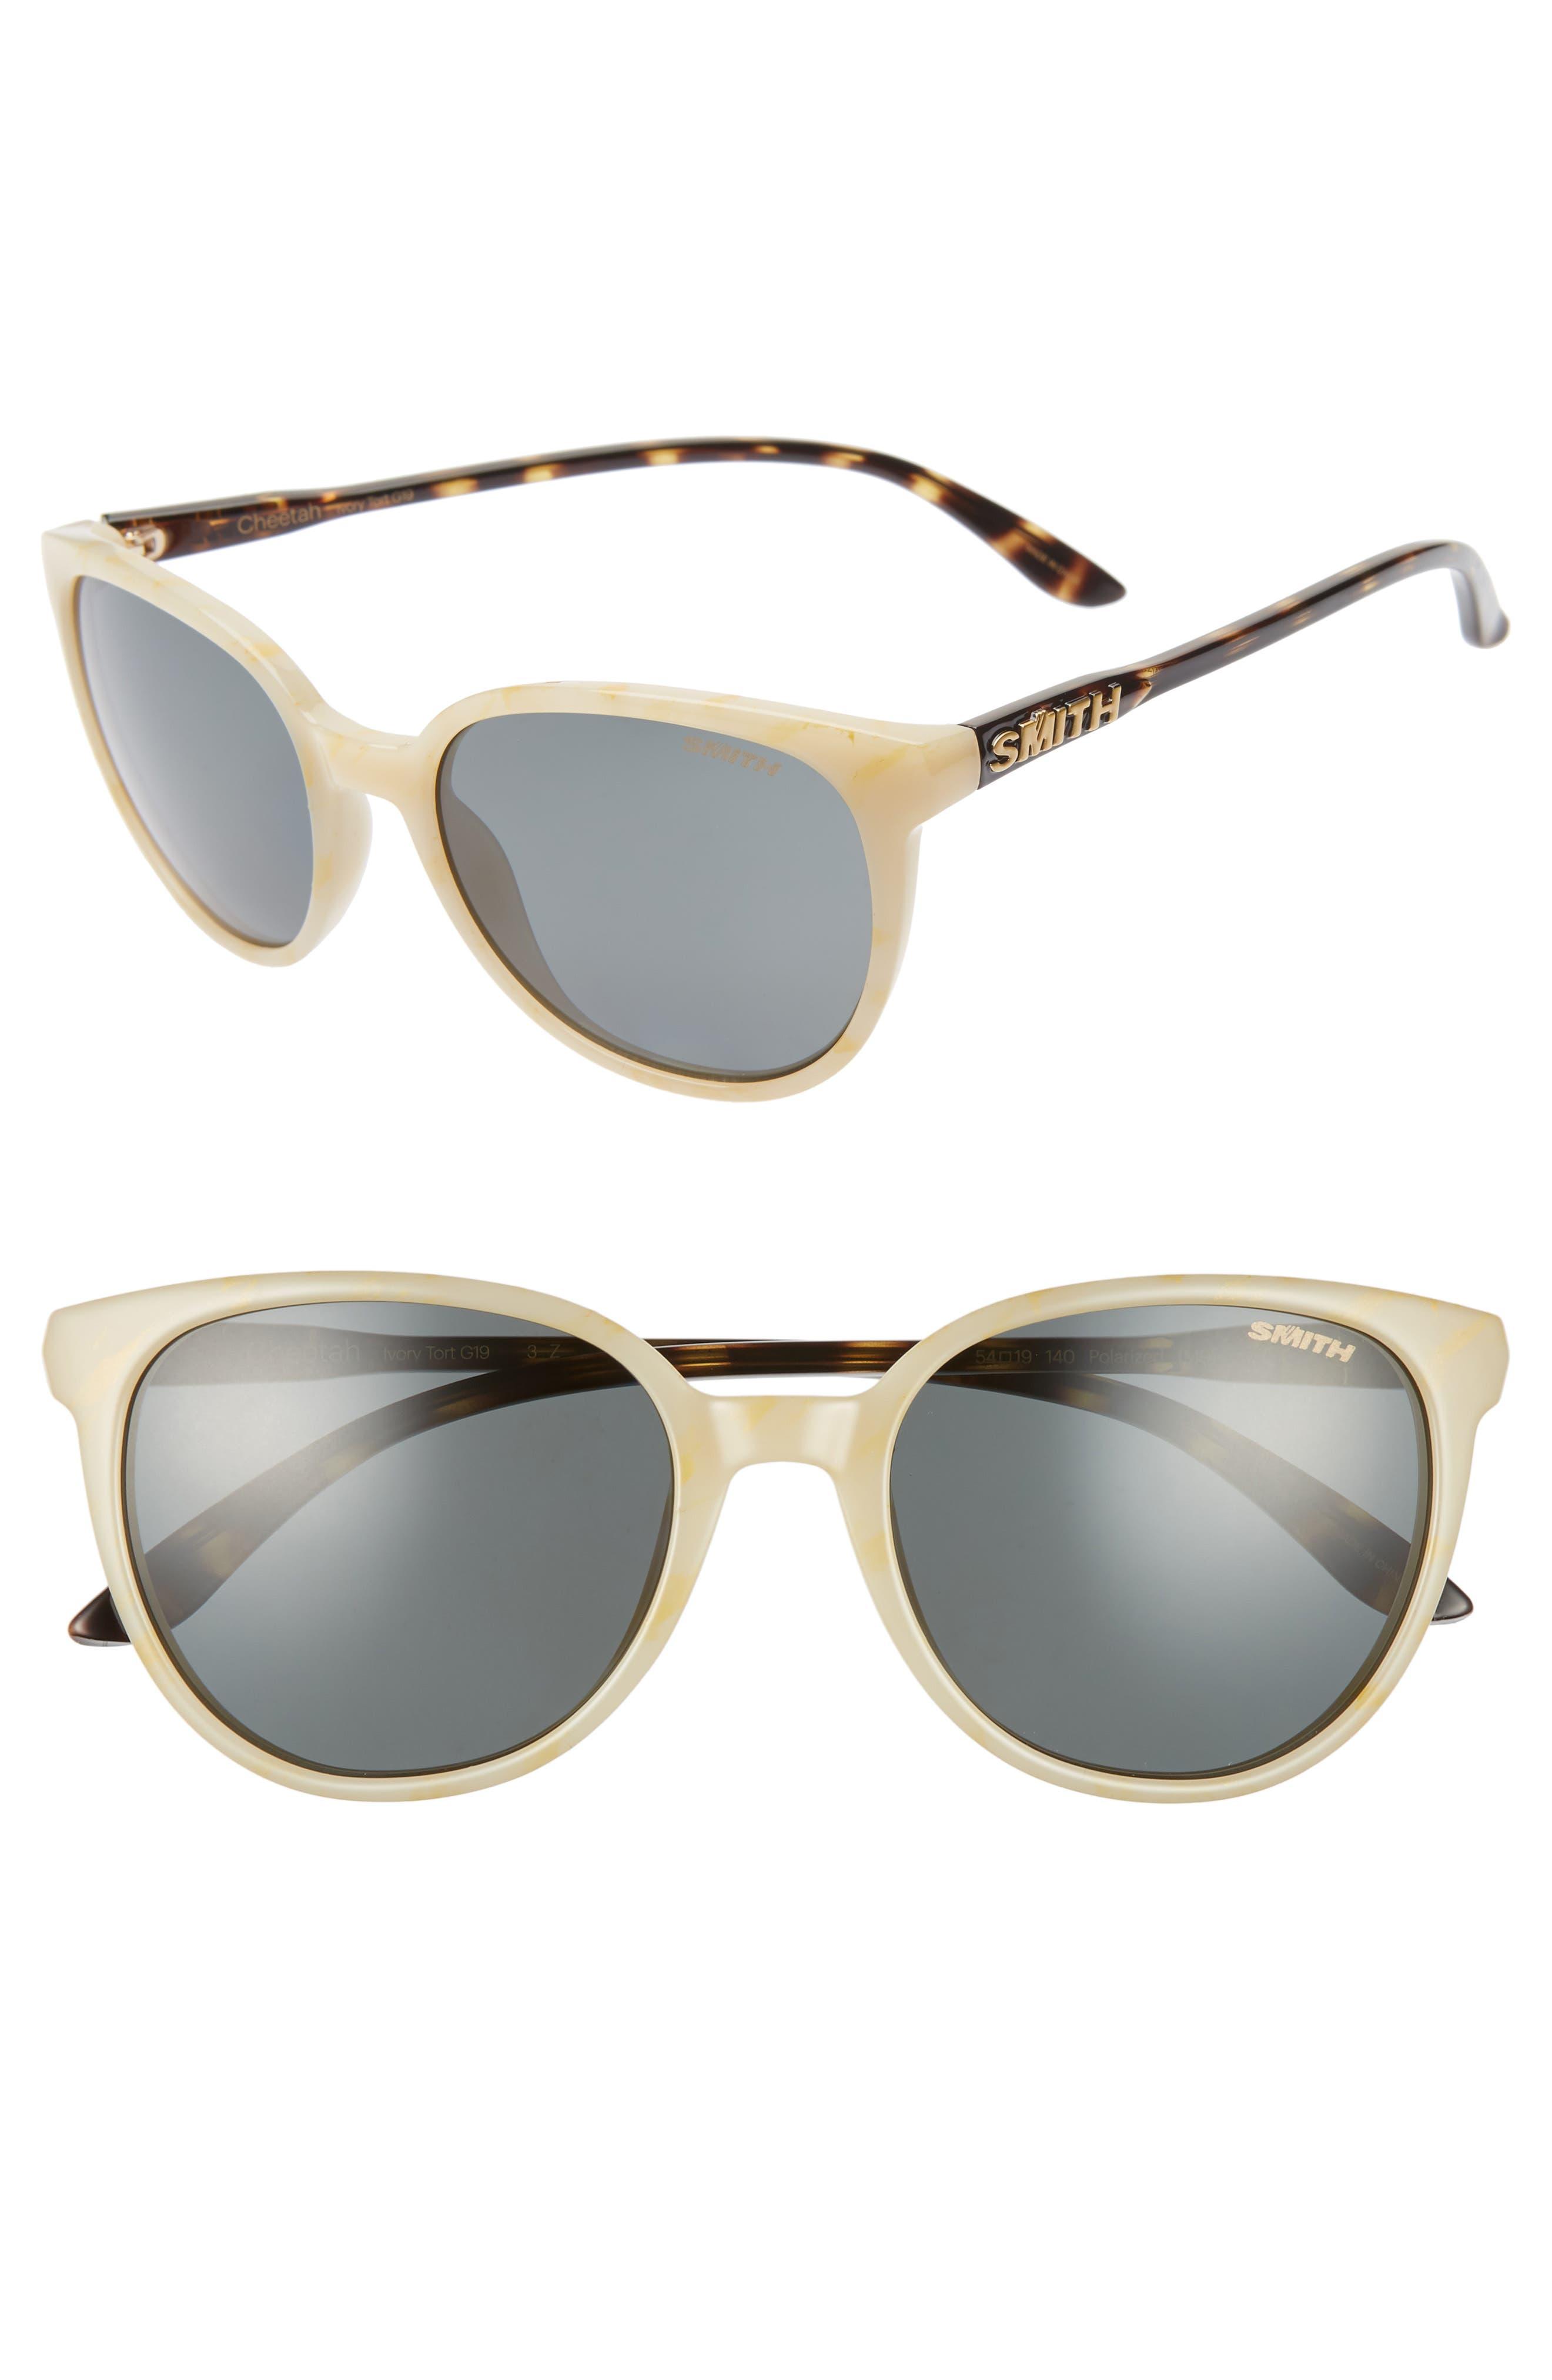 SMITH Cheetah 54mm ChromaPop<sup>™</sup> Polarized Round Sunglasses, Main, color, IVORY TORTOISE